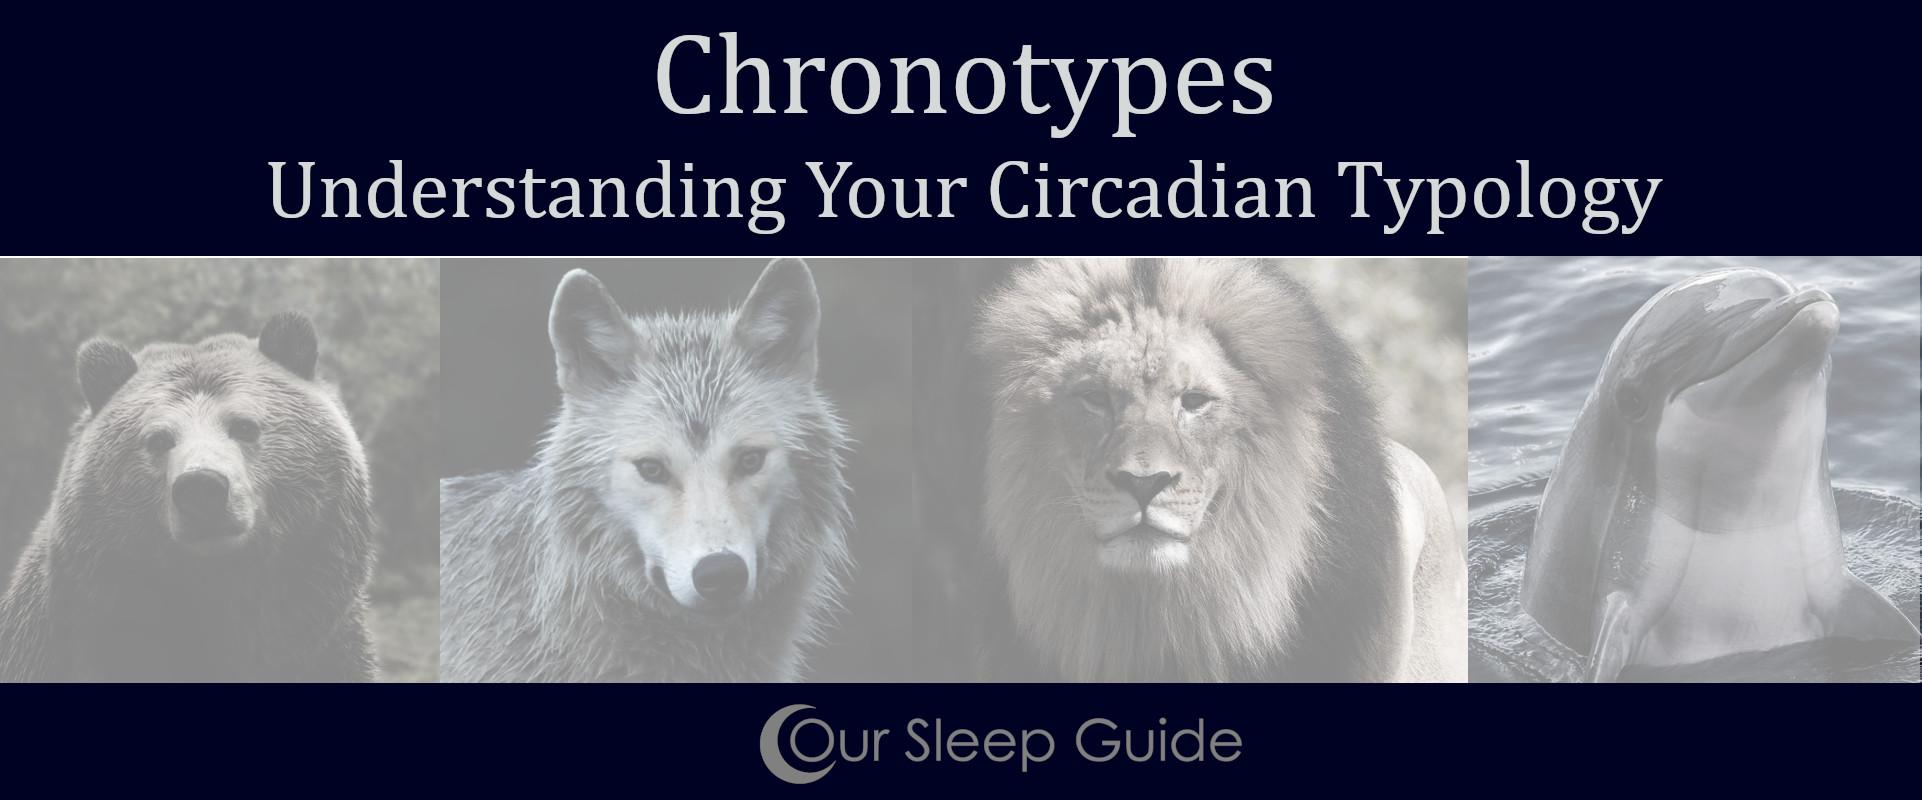 chronotype understanding your circadian typology